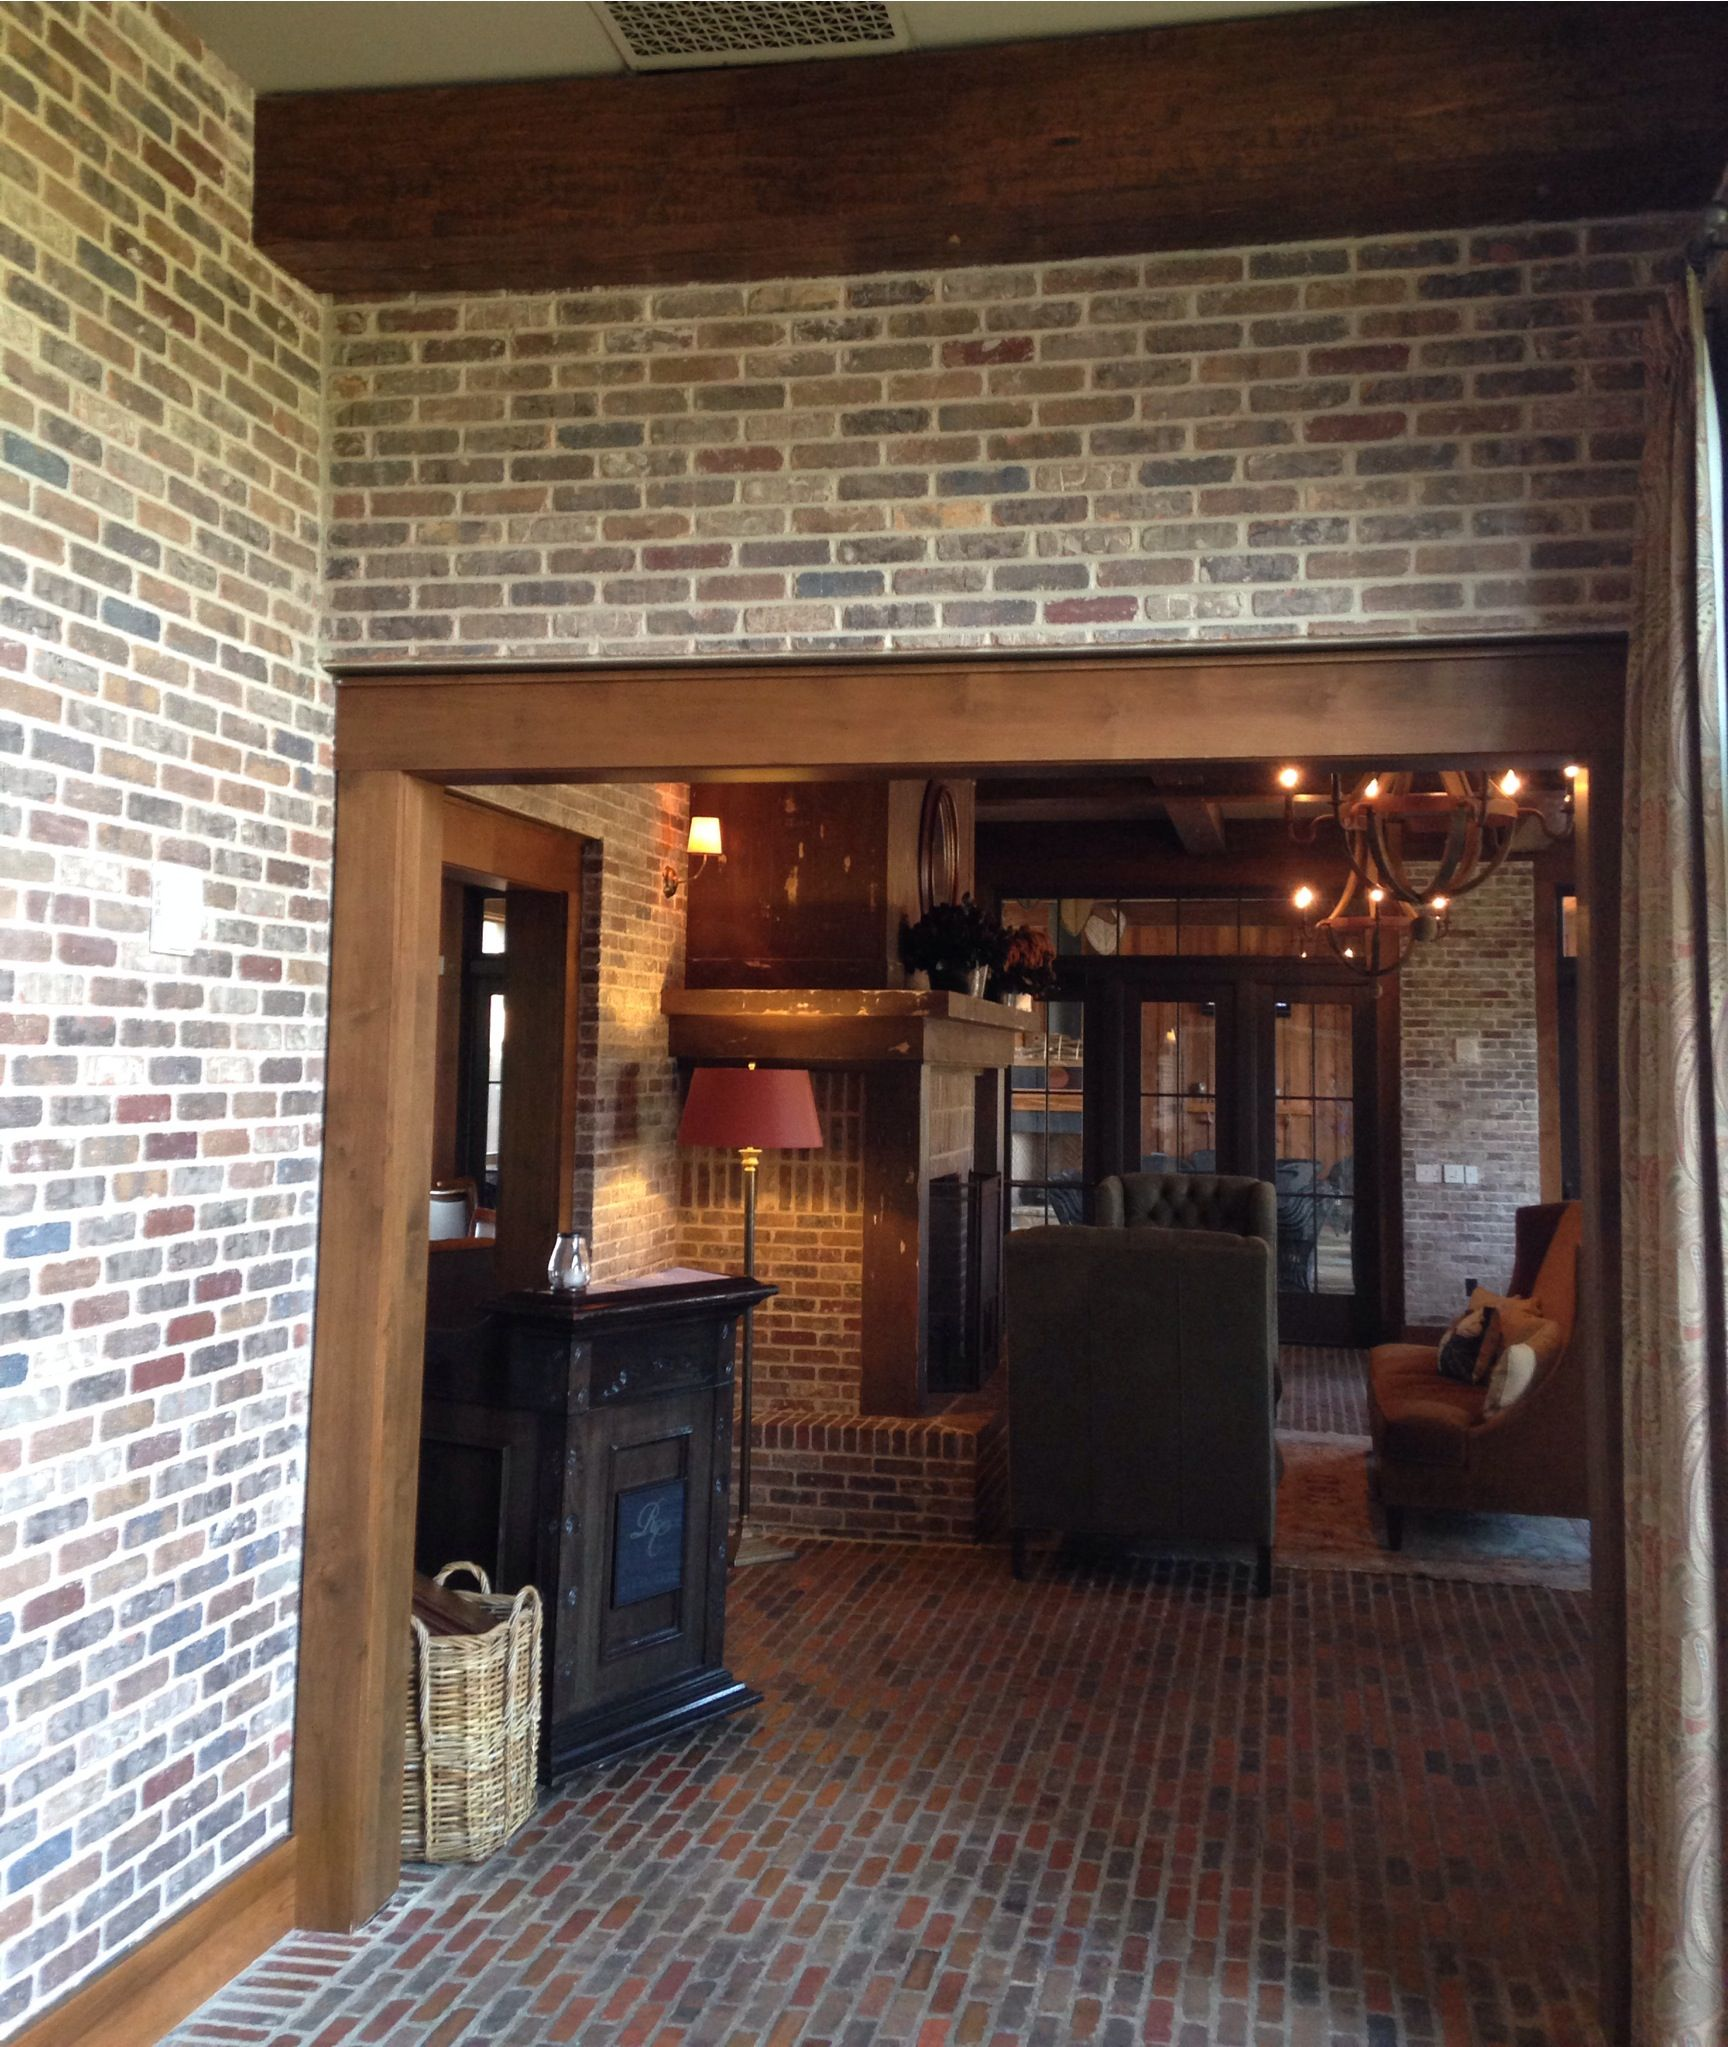 Pepper Mill Thin Brick Ivory Mortar Walls Floors Thin Brick Pinterest Thin Brick Bricks